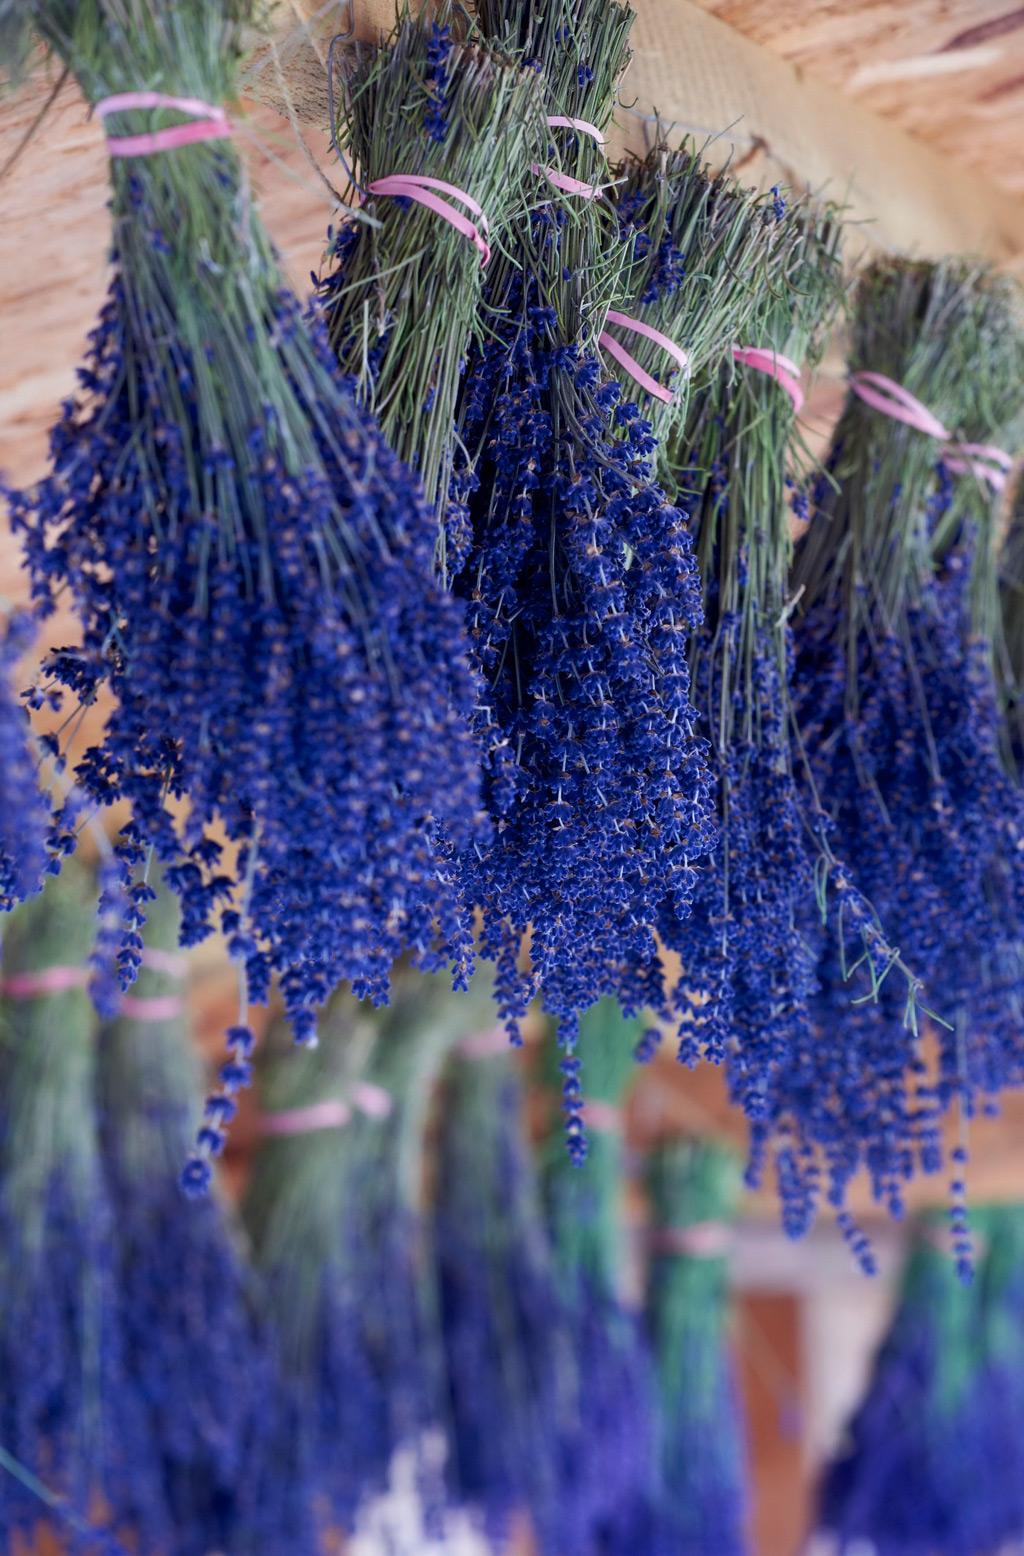 Beliebt Bevorzugt Lavendel trocknen | selbst.de @HN_86